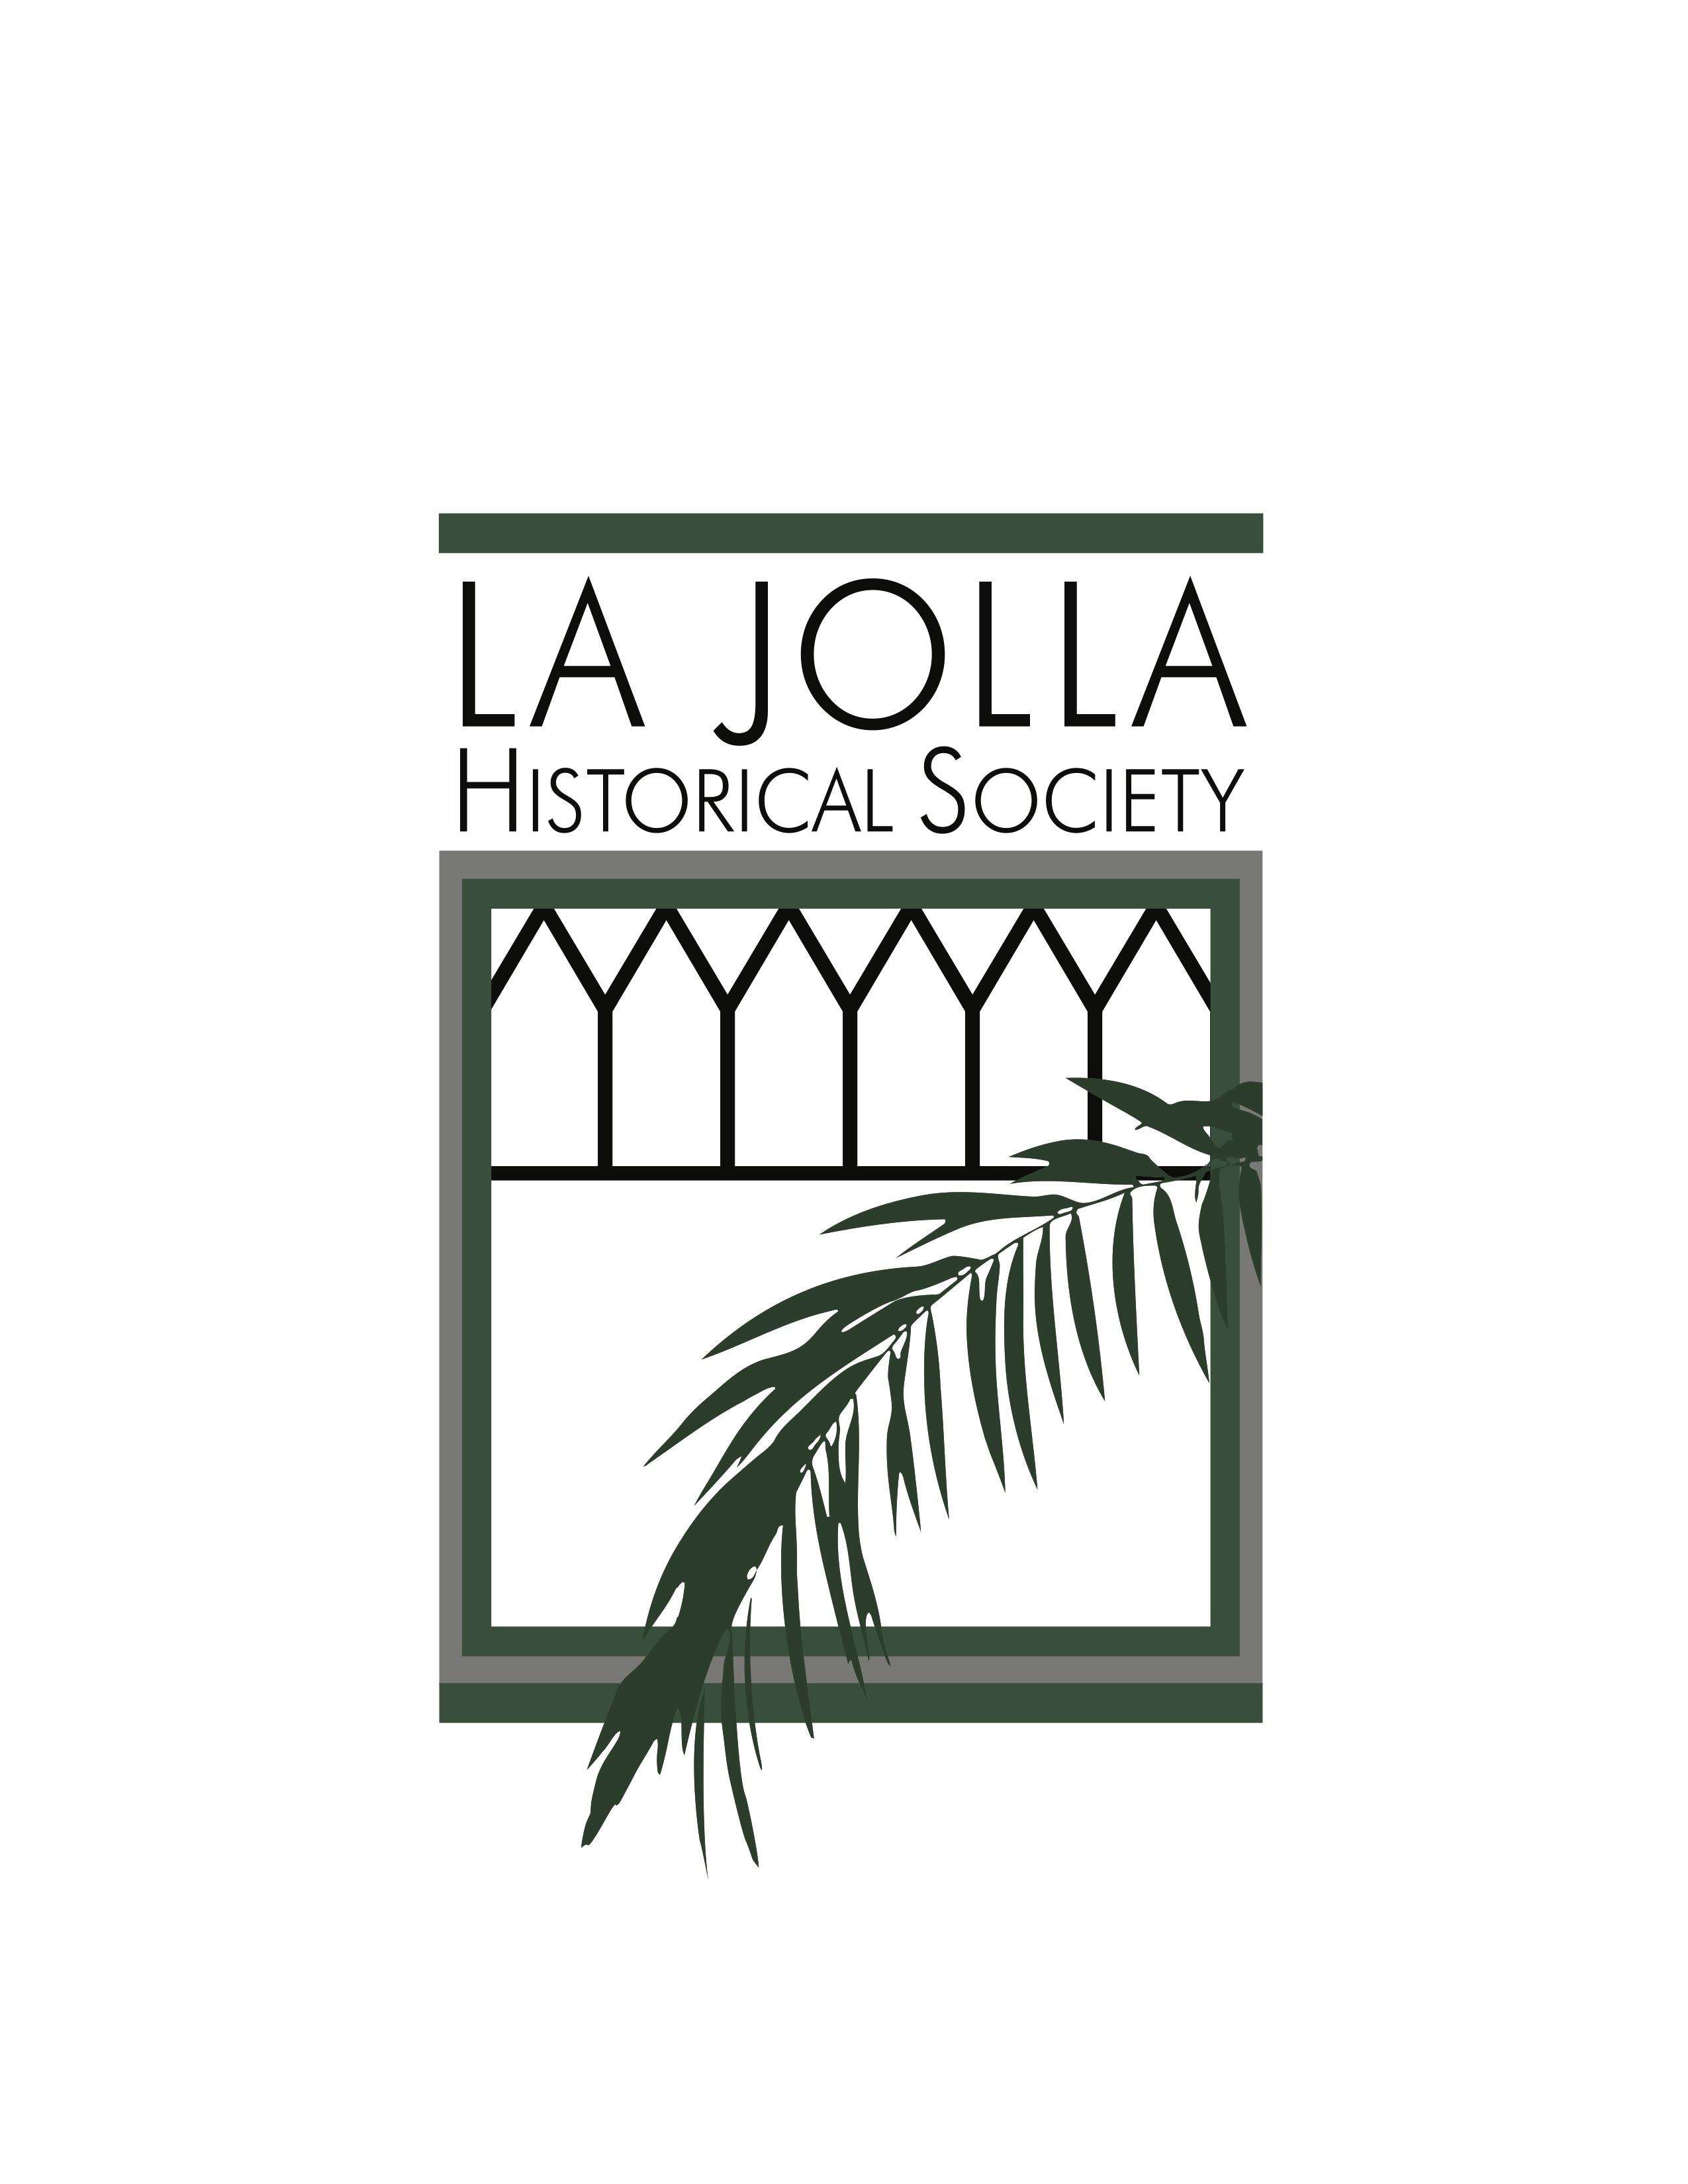 La Jolla Historical Society logo